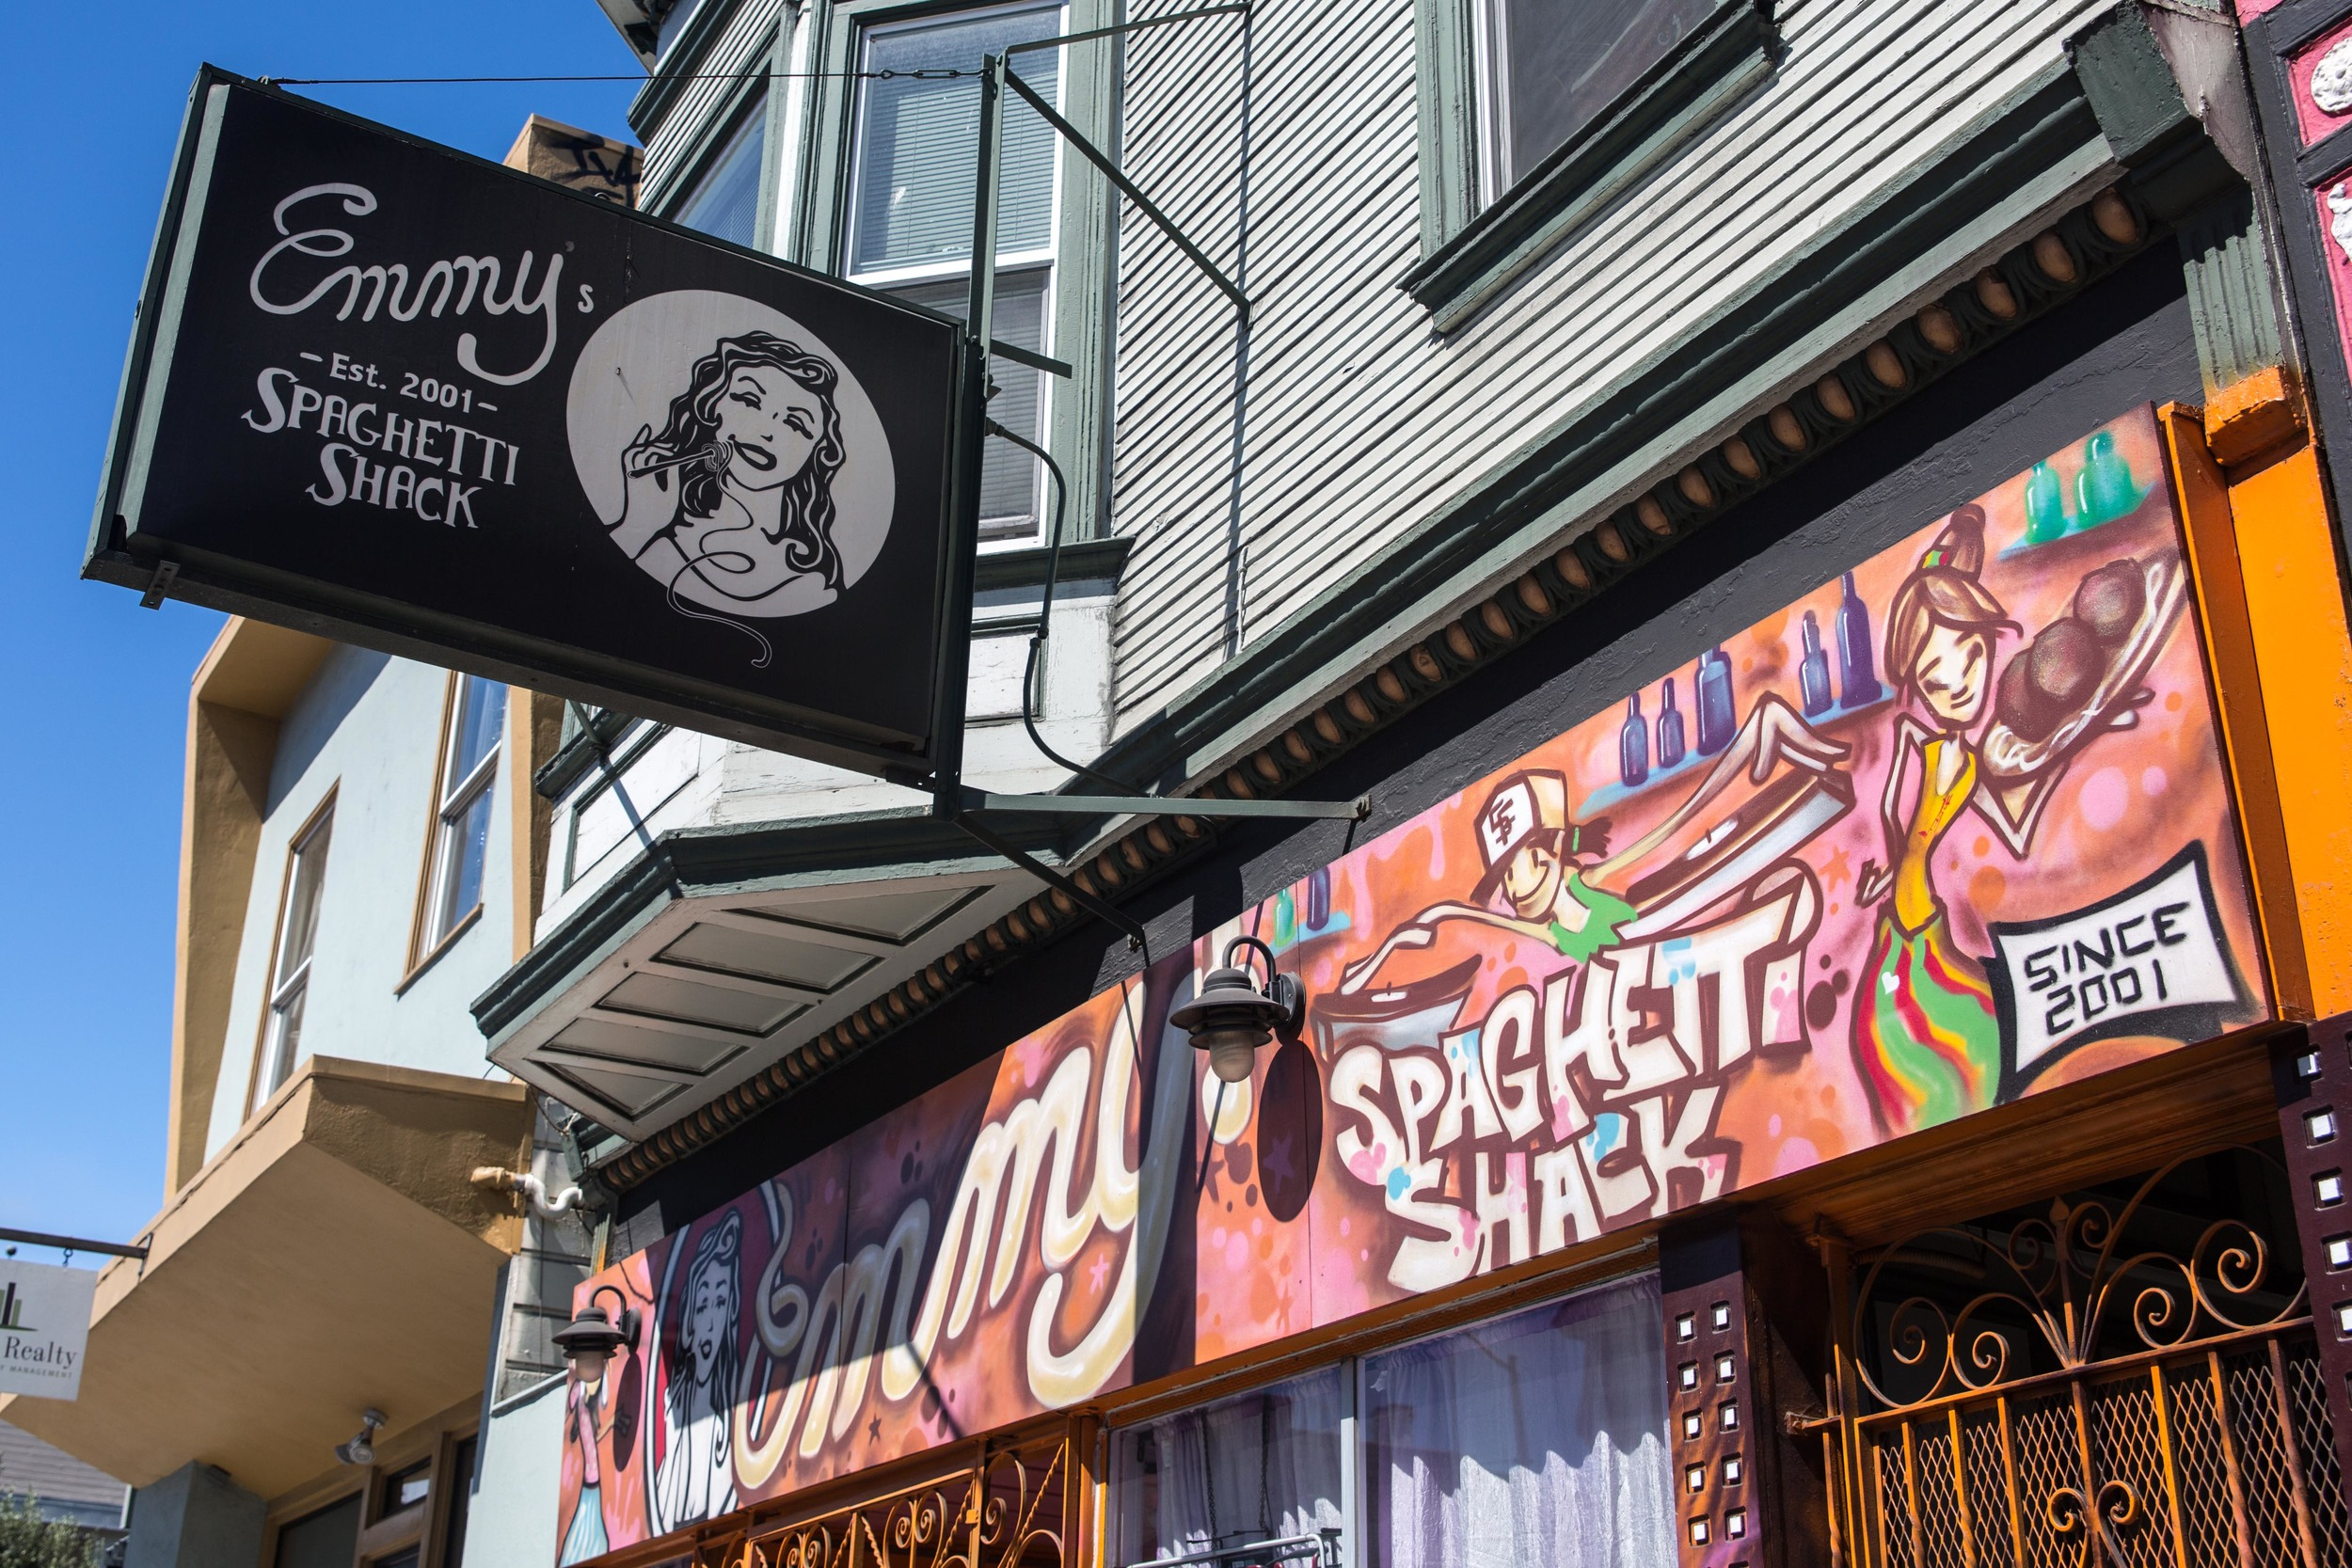 EMMY'S SPAGHETTI SHACK  - 3230 MISSION STREET - 415.206.2086